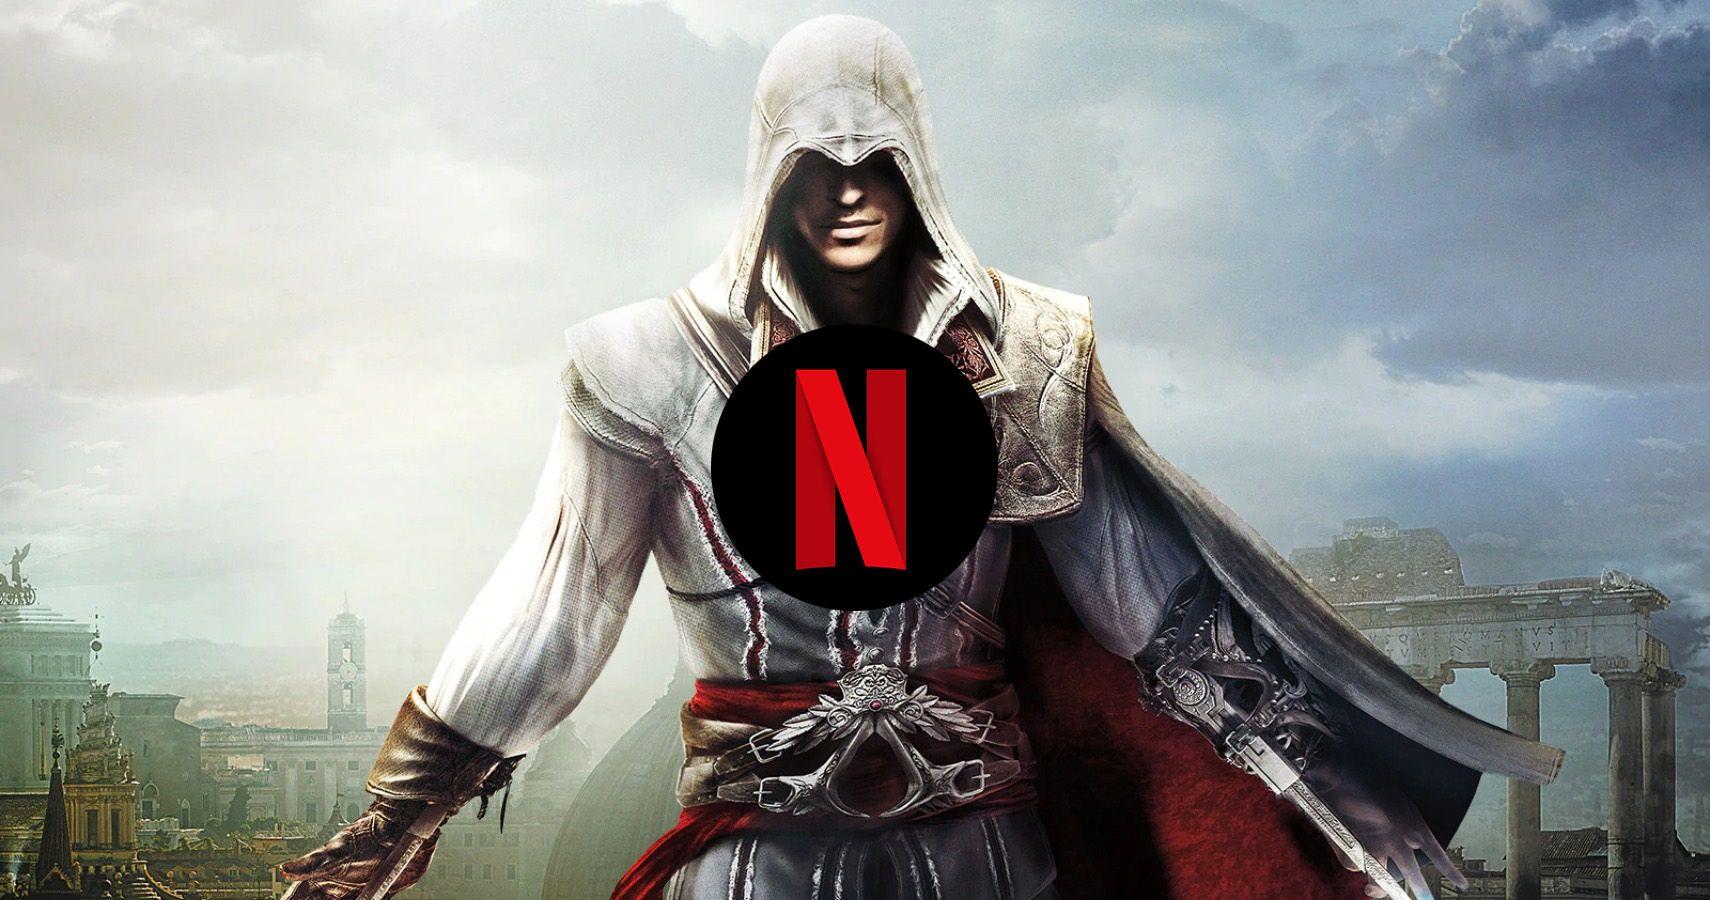 Creed Netflix